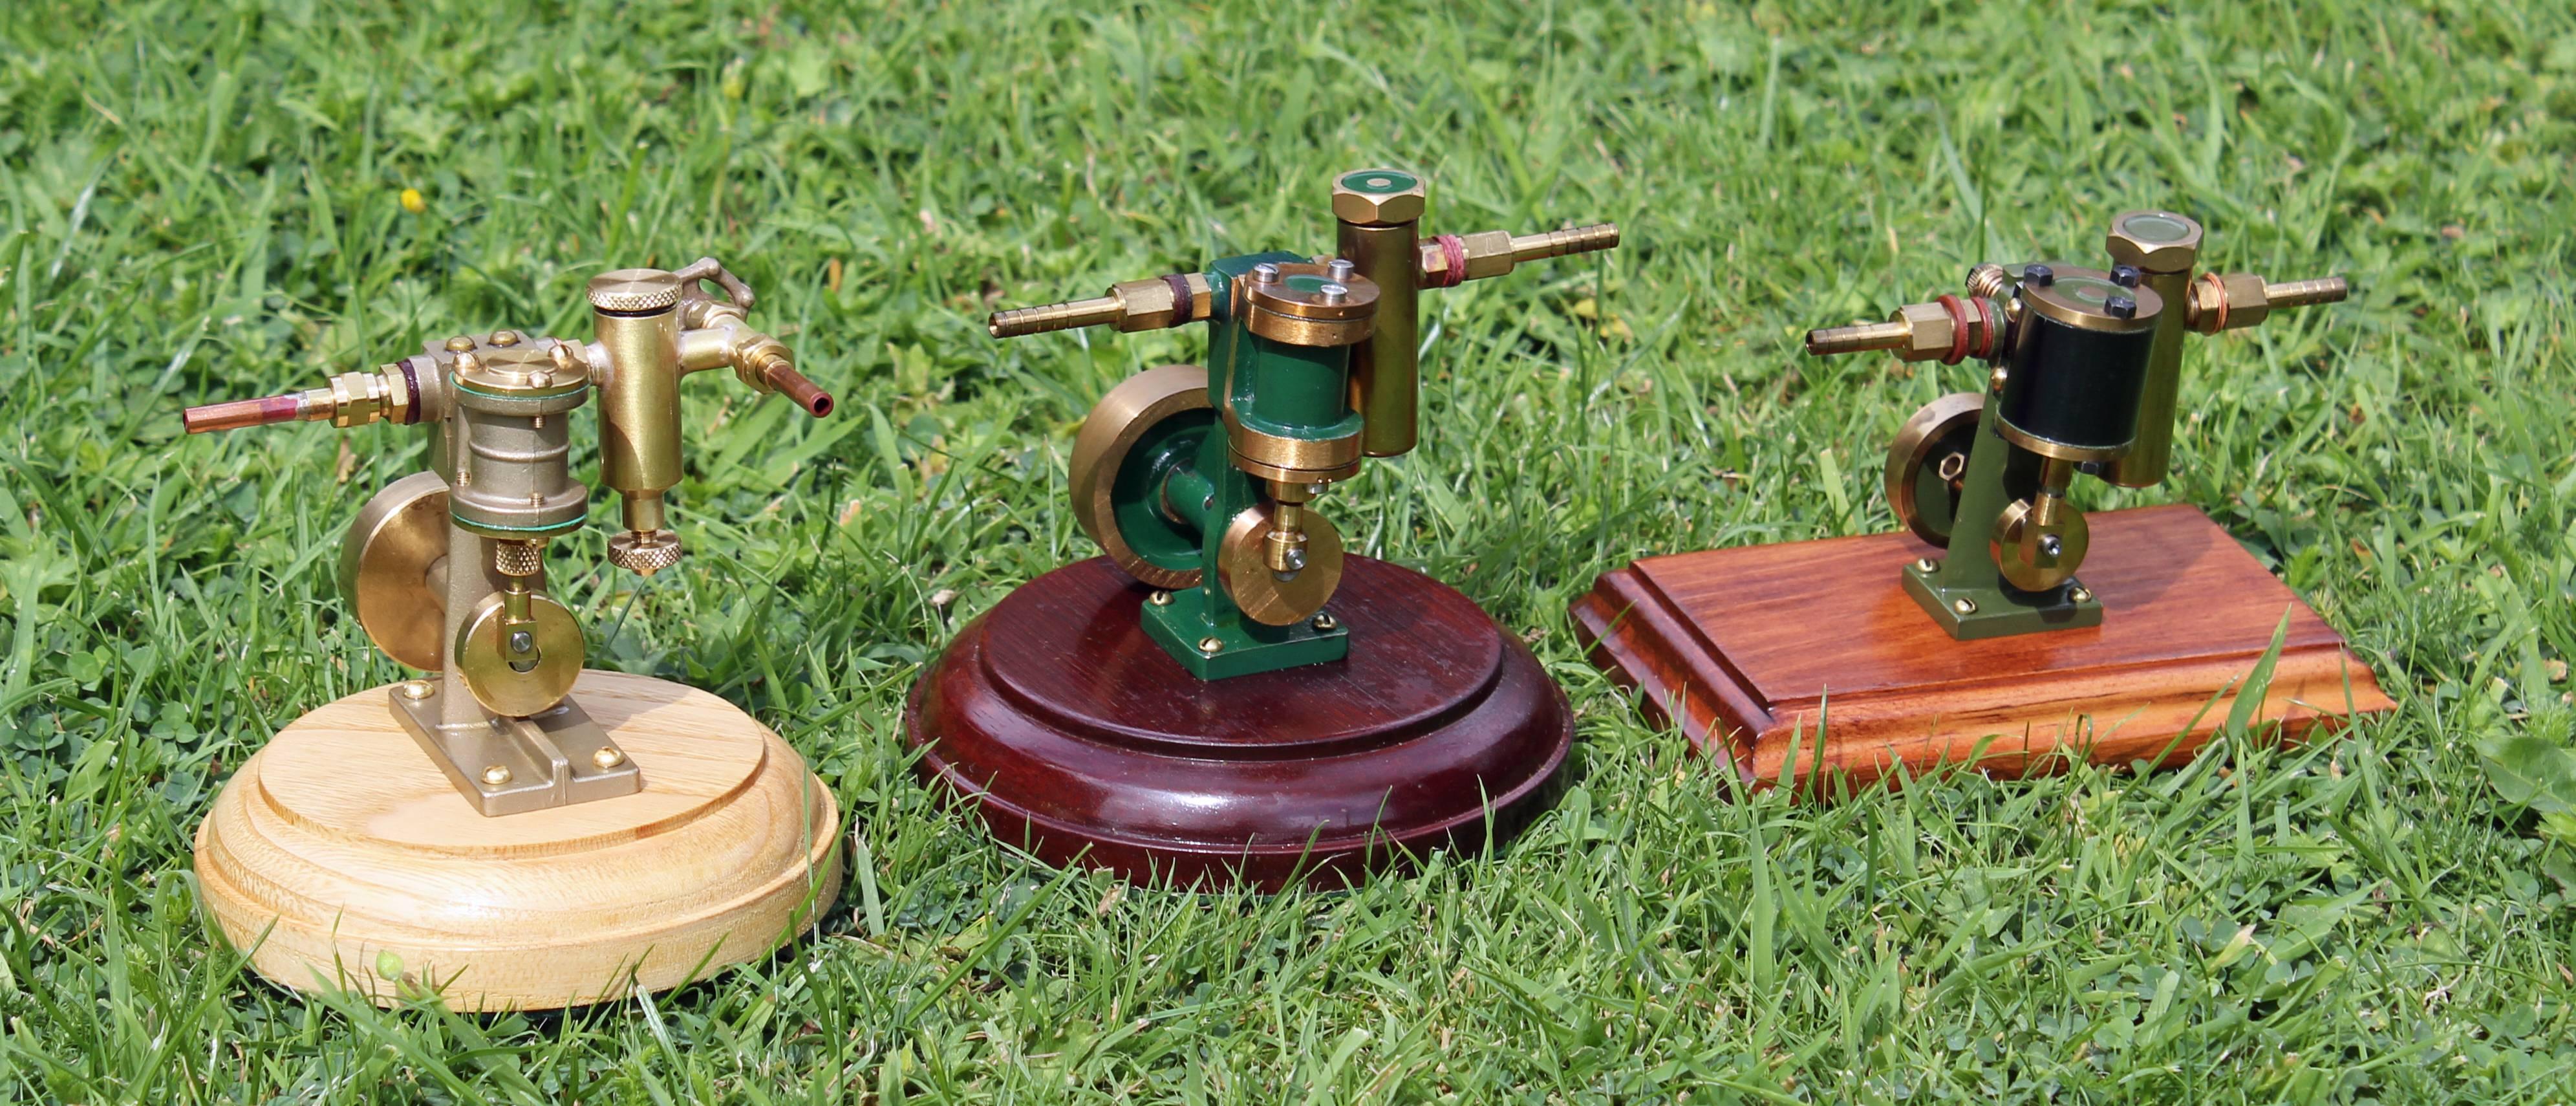 Model Oscillating Engines